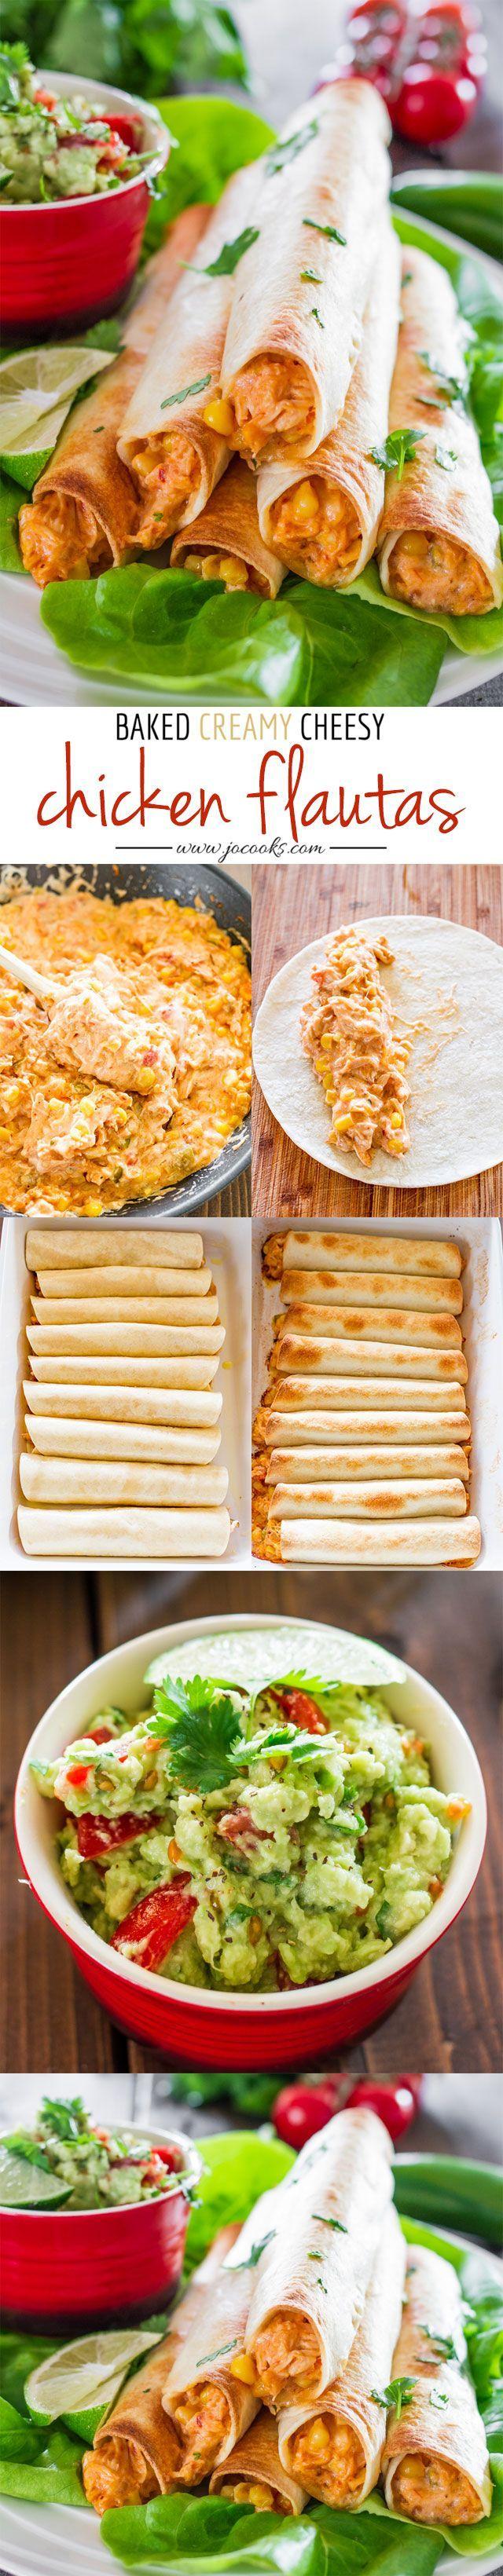 Baked Creamy Cheesy Chicken Flautas with Guacamole #flautas #texmex #dan330 http://livedan330.com/2015/03/27/baked-creamy-cheesy-chicken-flautas-with-guacamole/